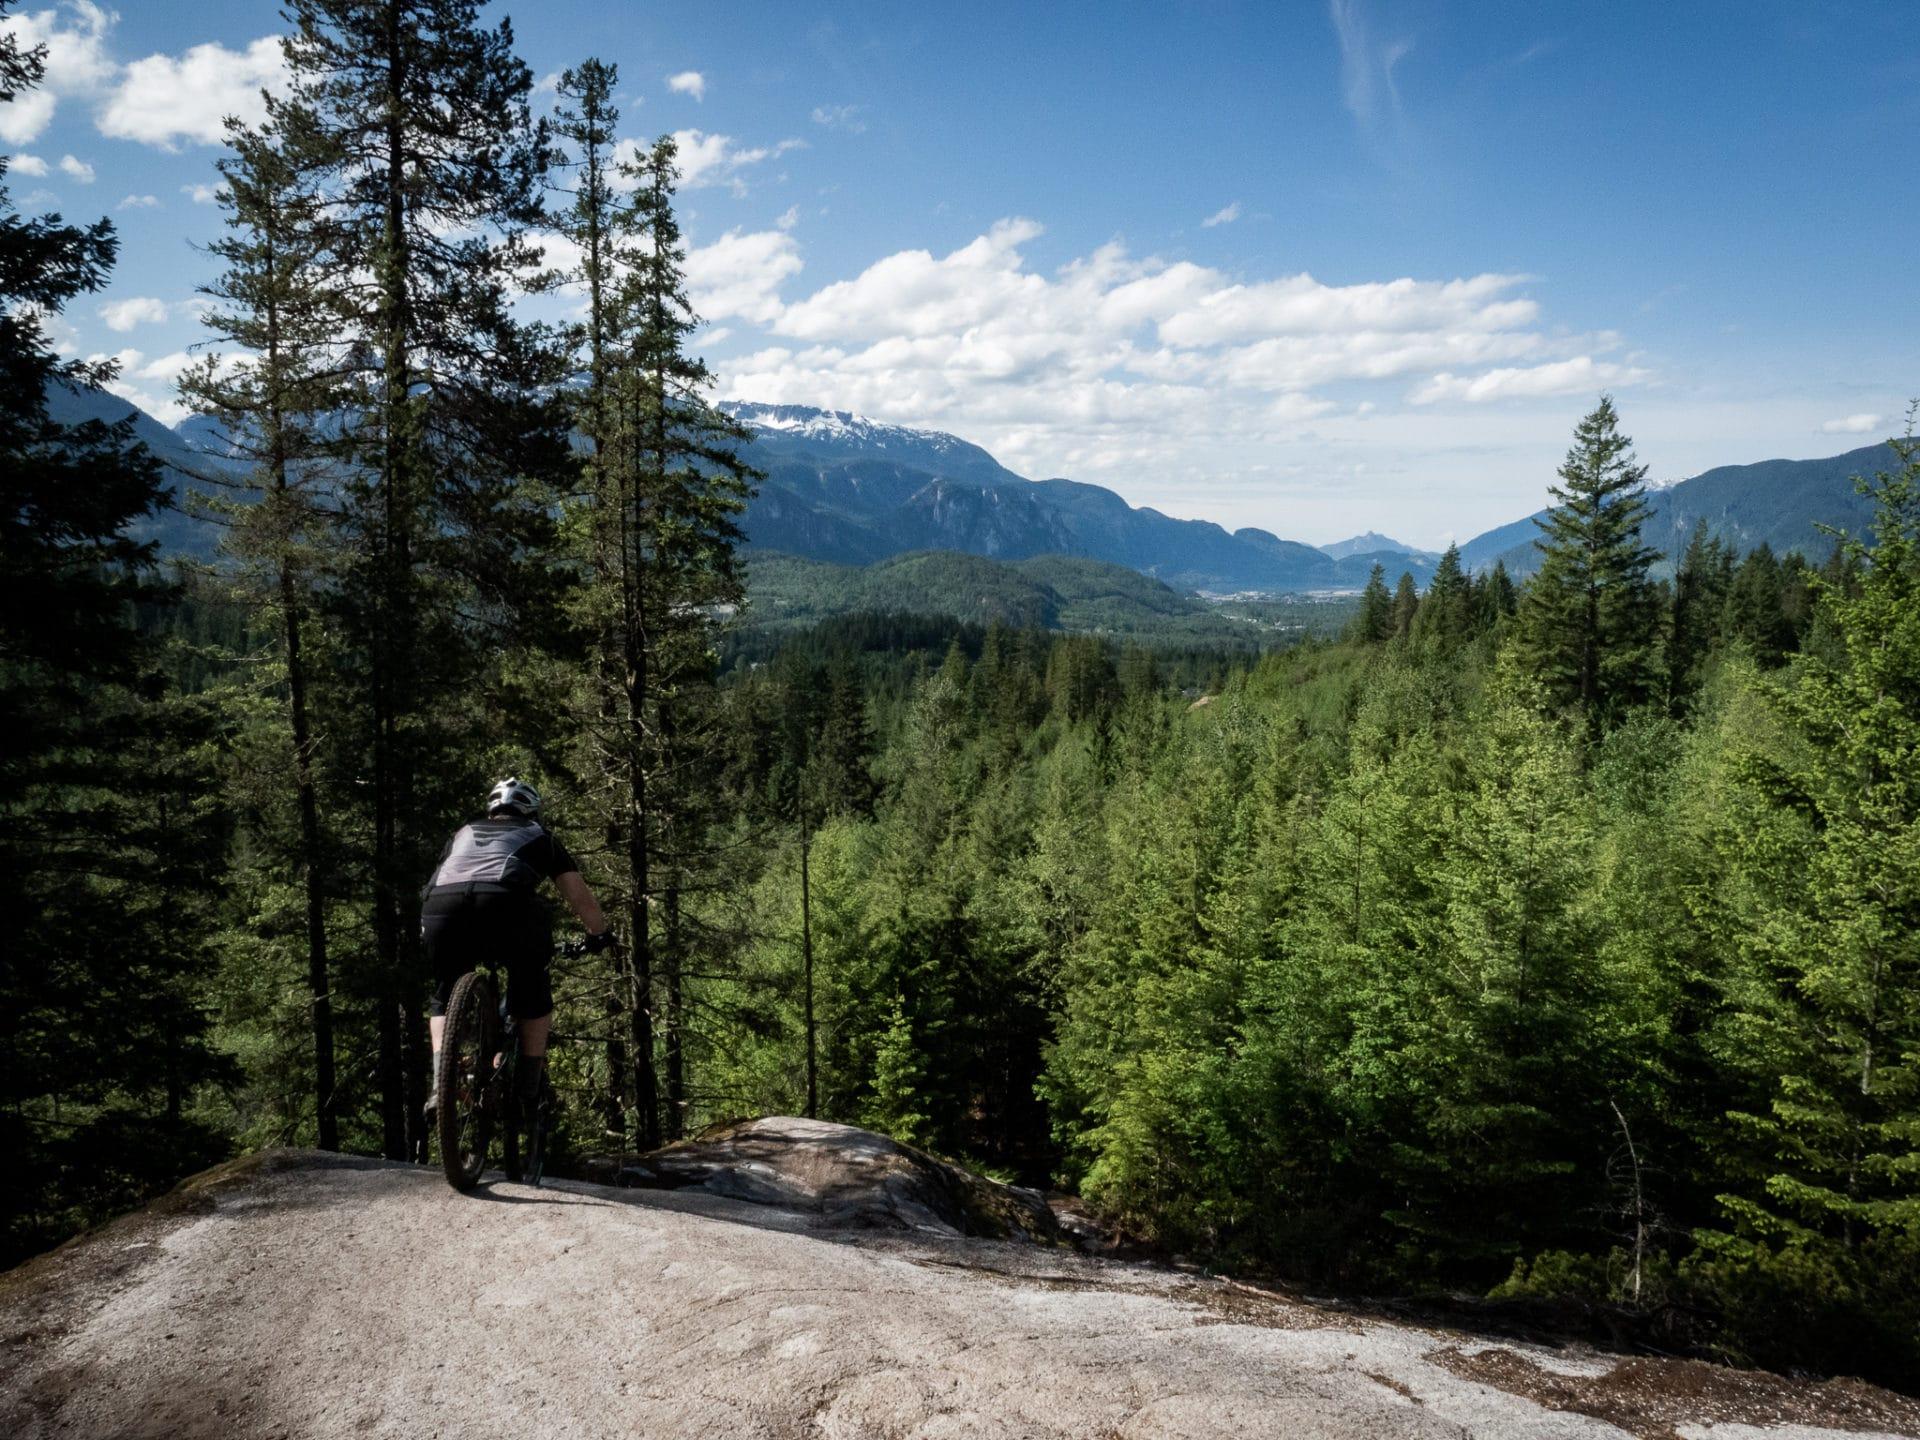 Squamish-Alice-Lake- Boney-Elbows